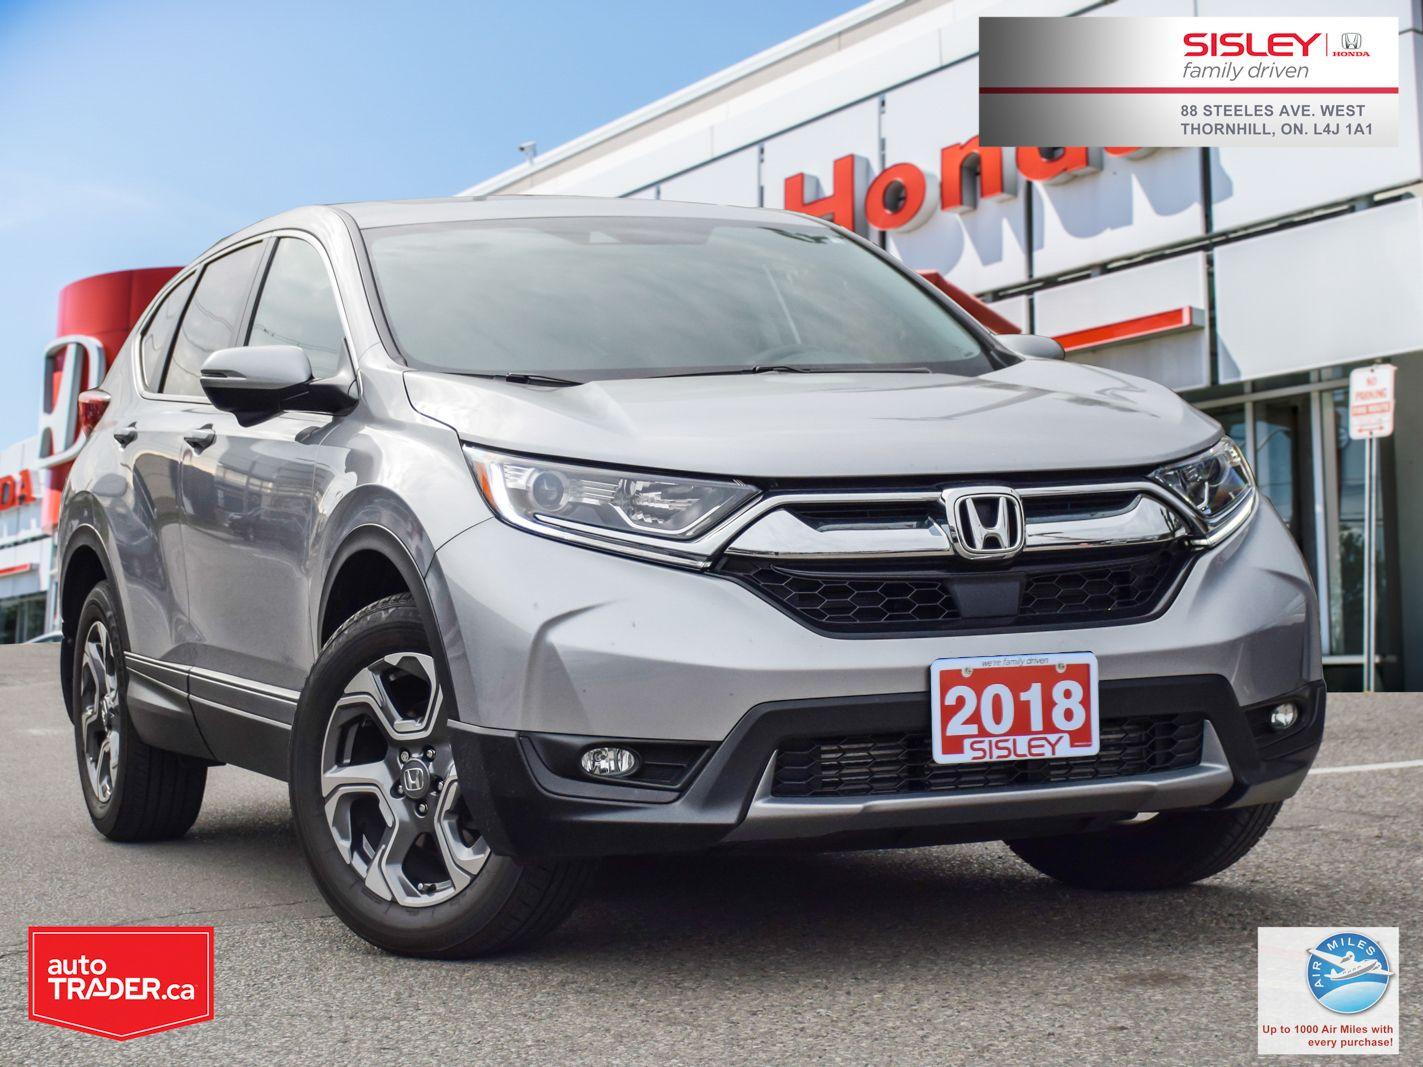 2018 Honda CR-V Image